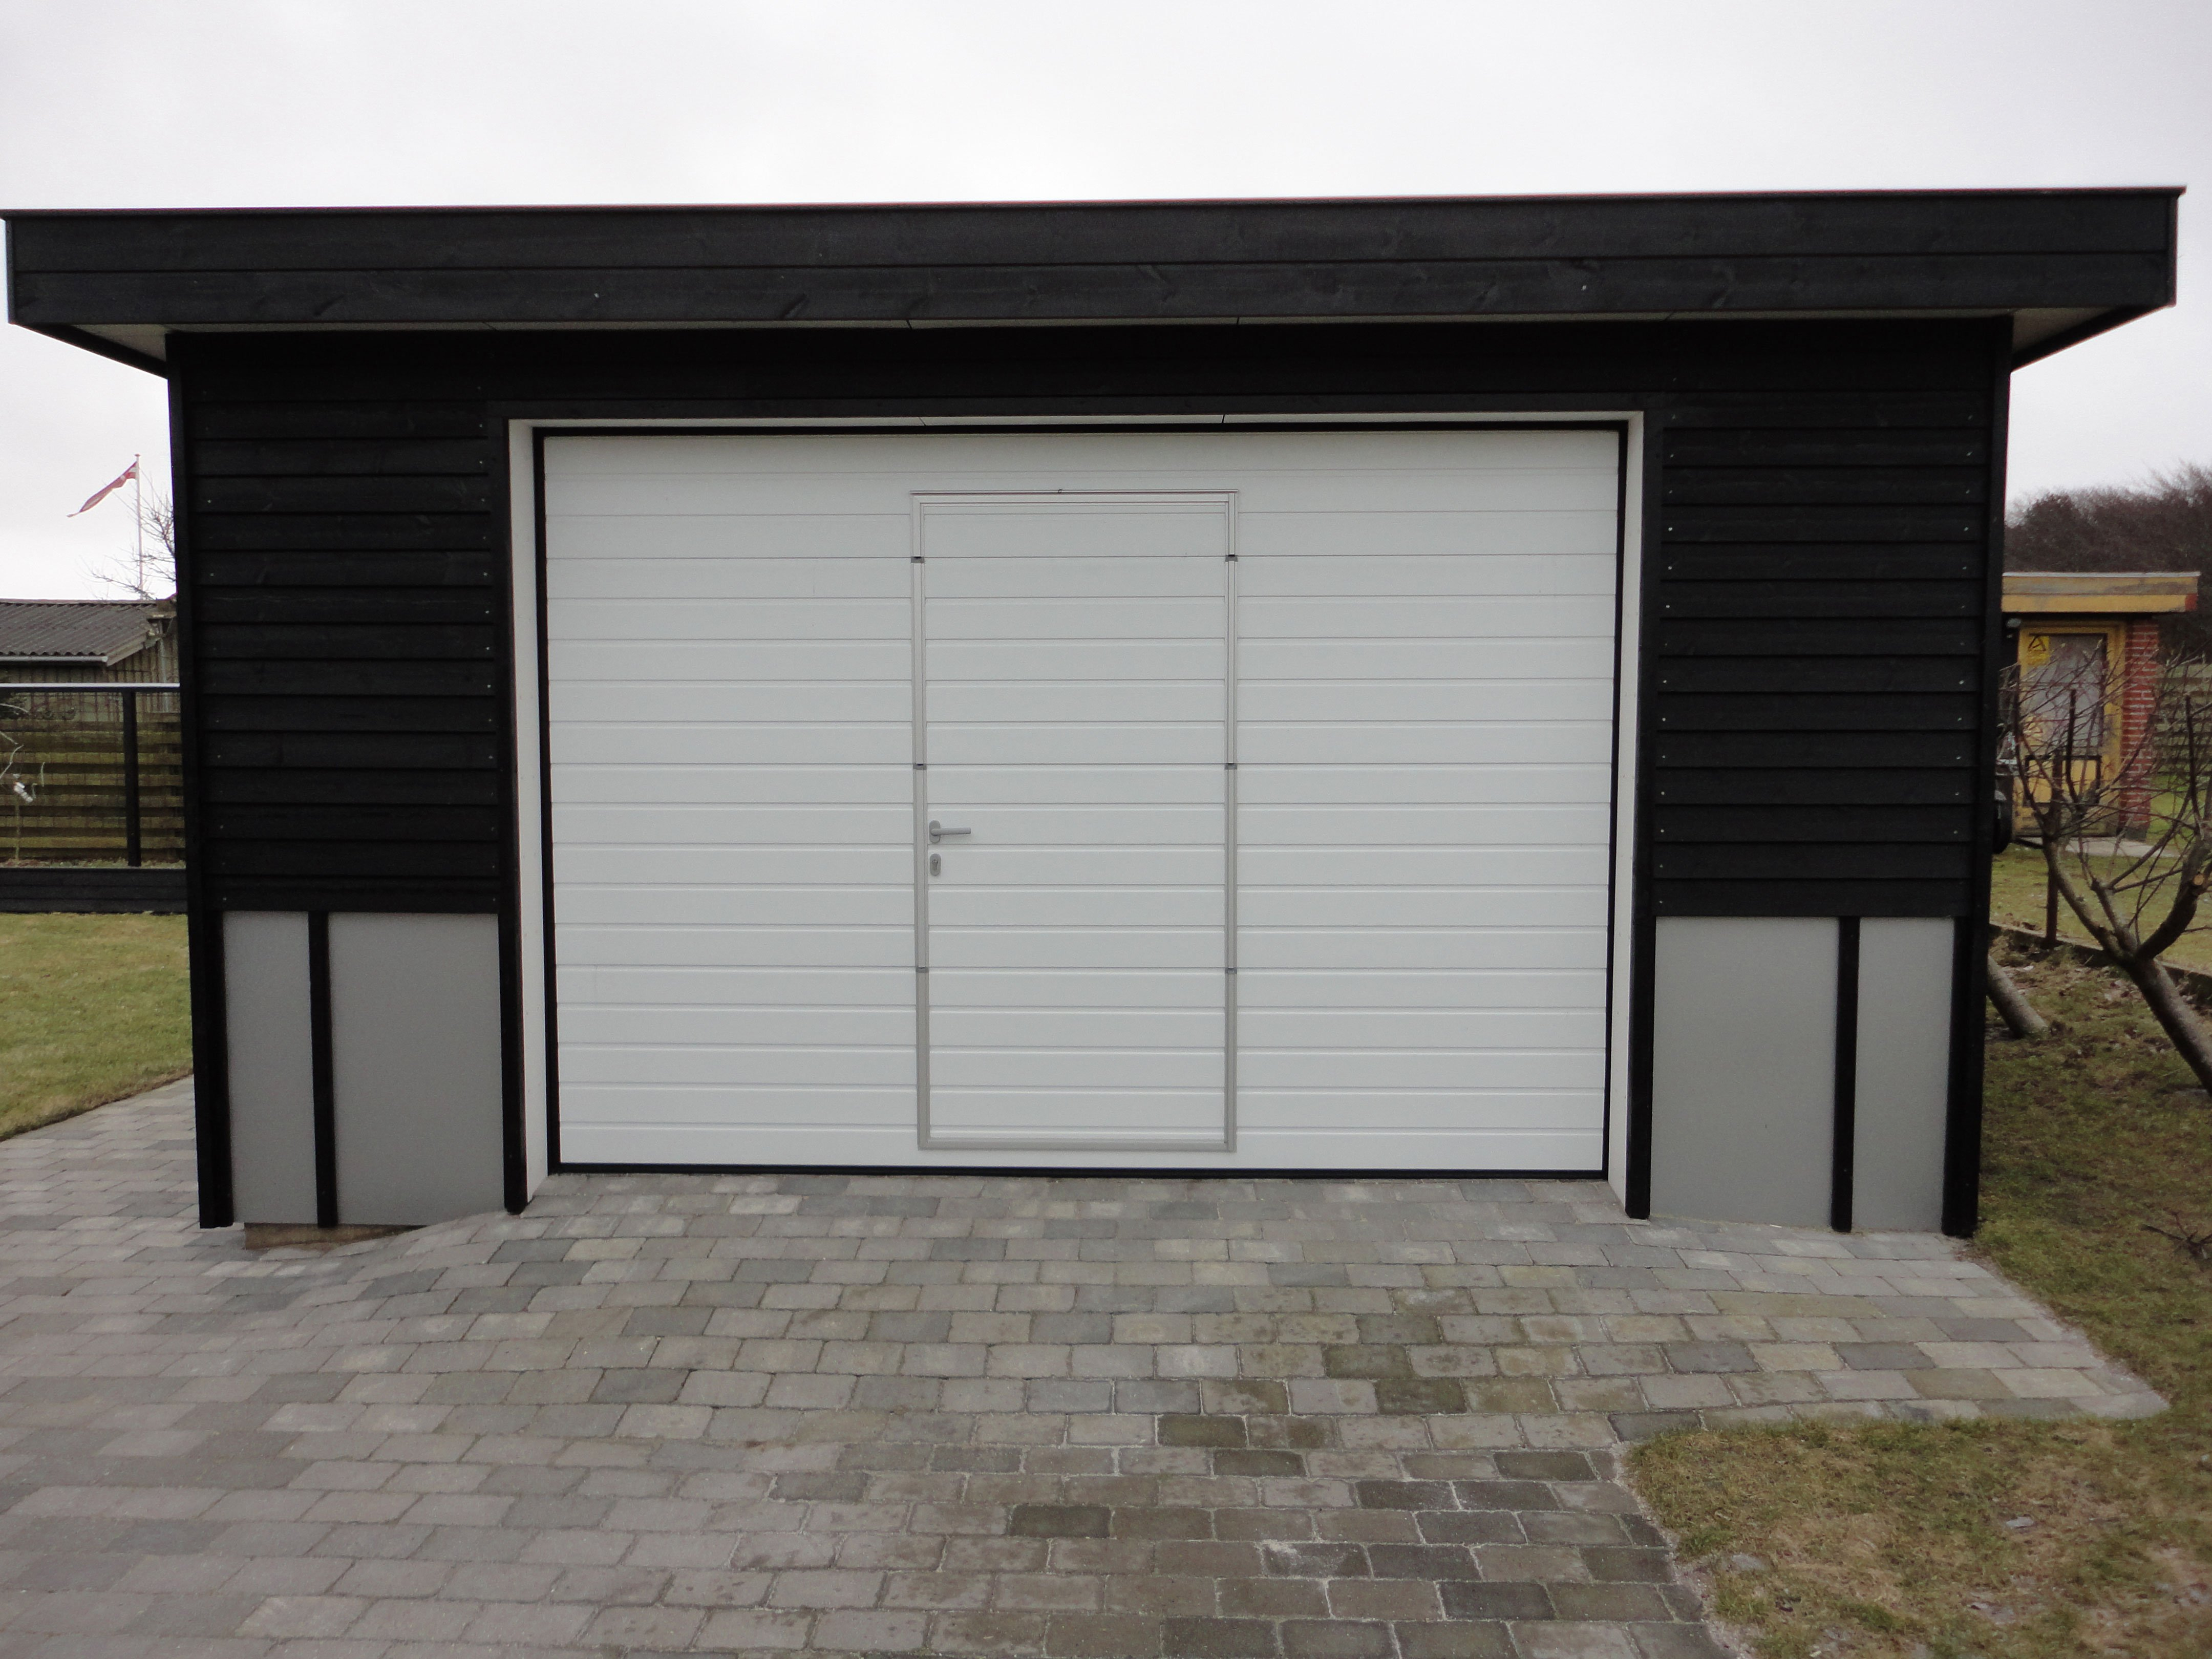 Калитка в воротах гаража фото